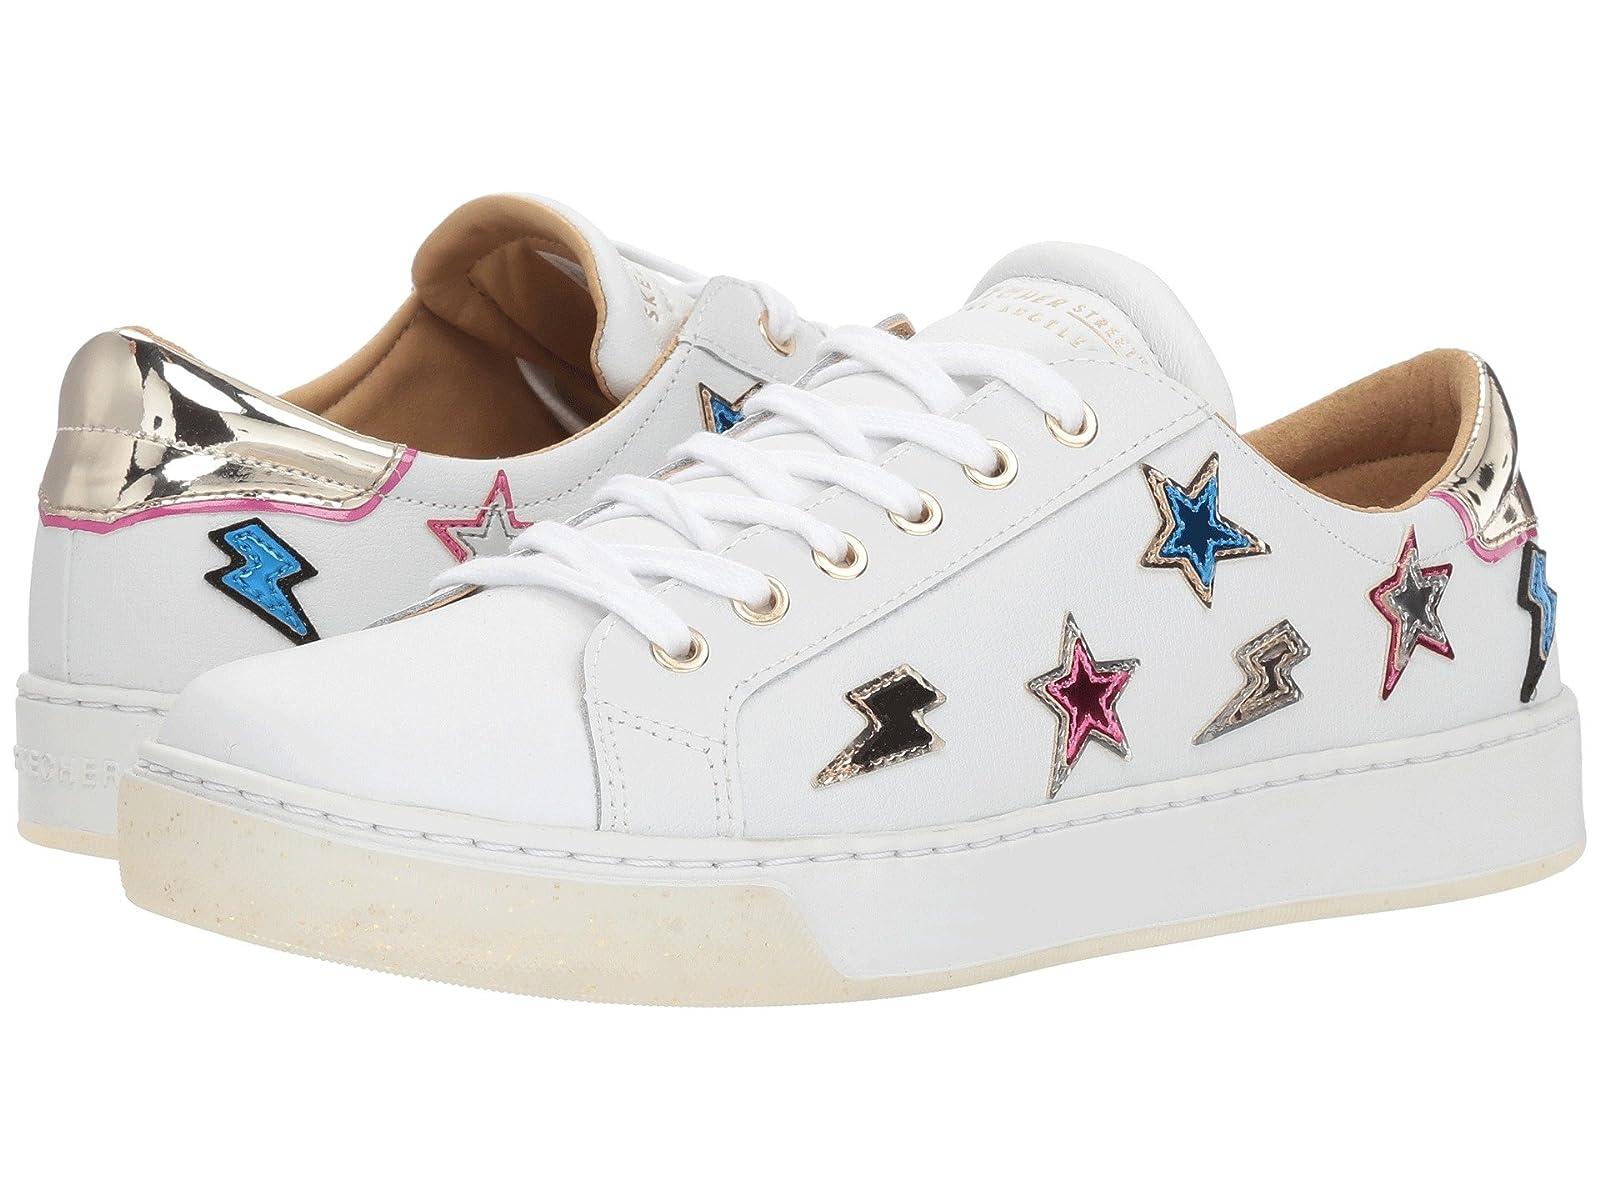 SKECHERS PrimaAtmospheric grades have affordable shoes